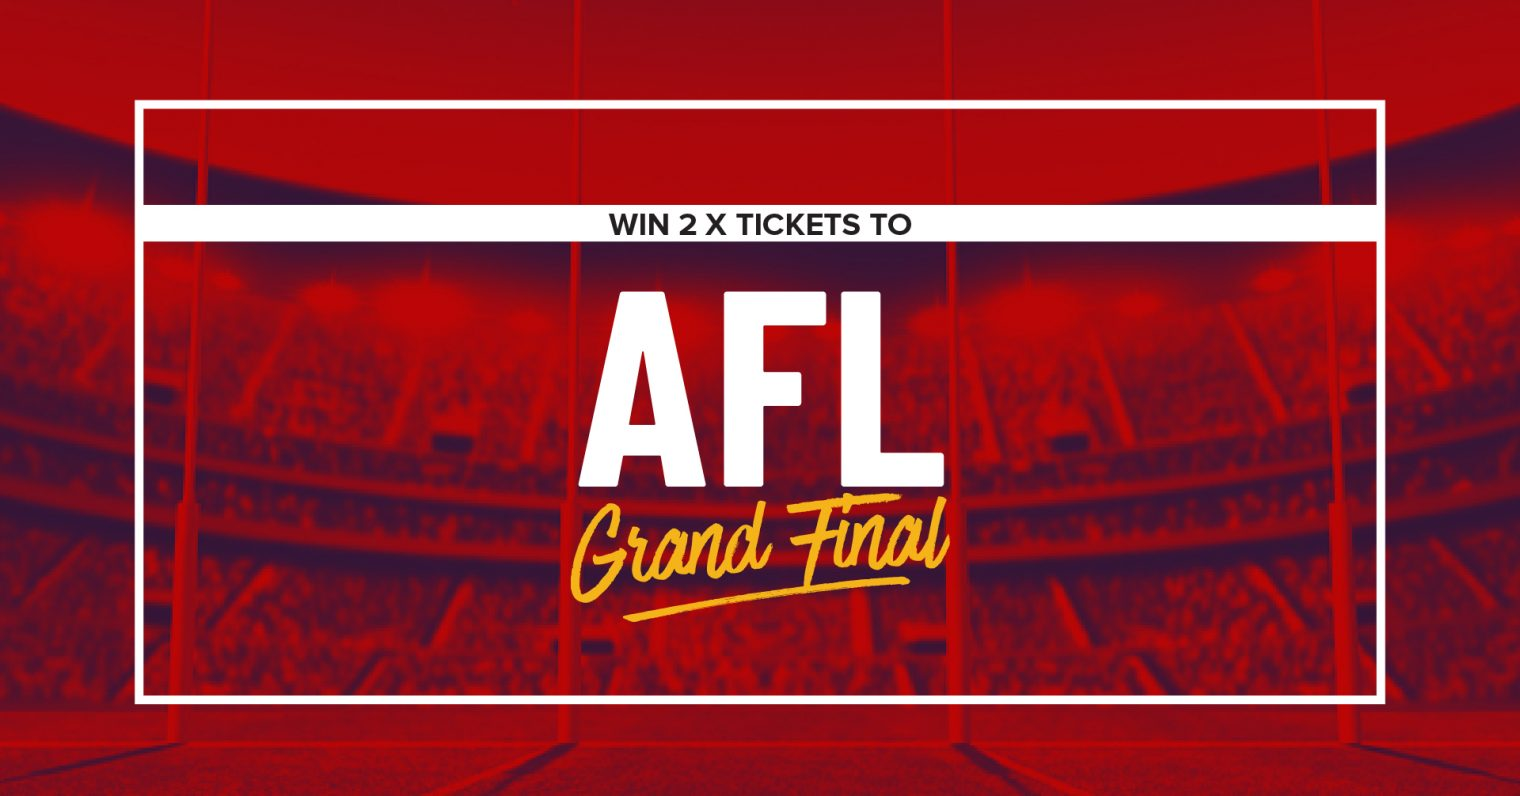 Grand Final AFL Tickets